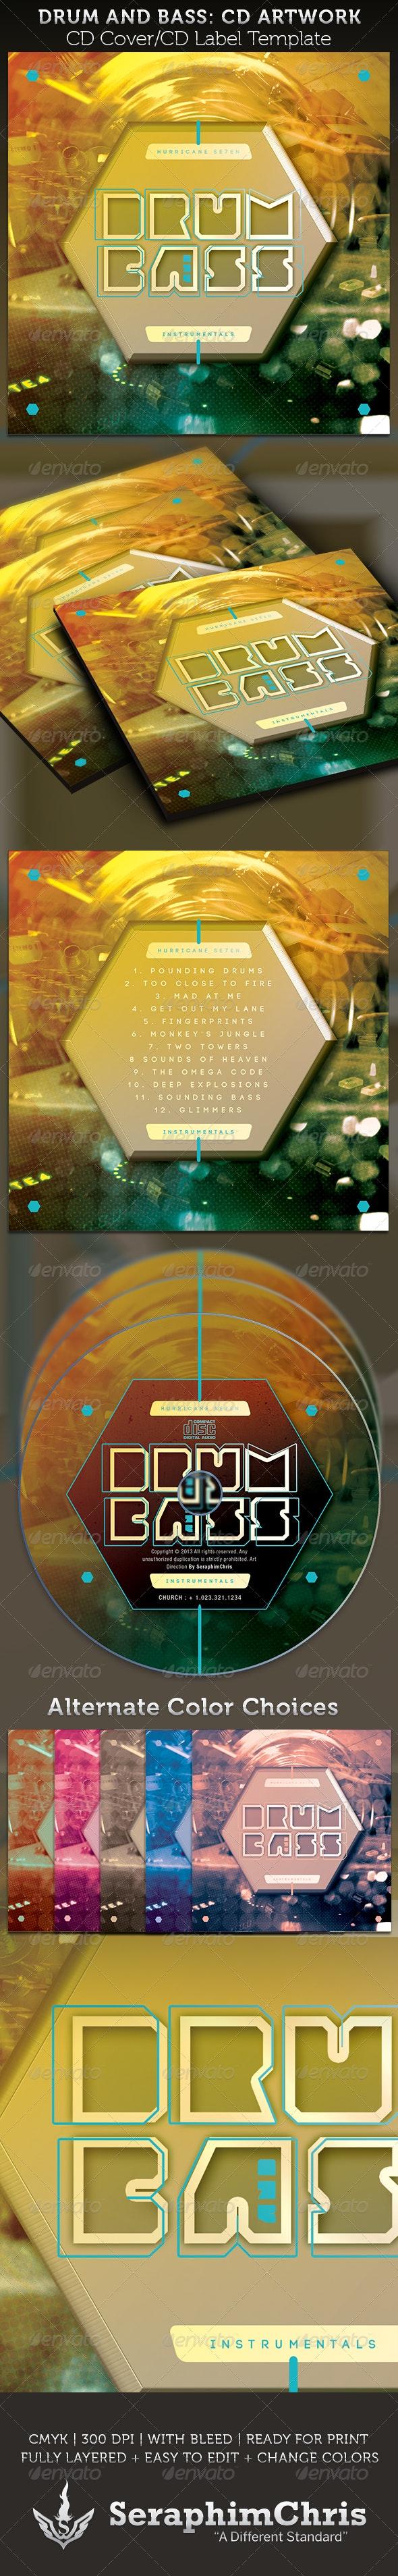 Drum and Bass CD Cover Artwork Template - CD & DVD Artwork Print Templates